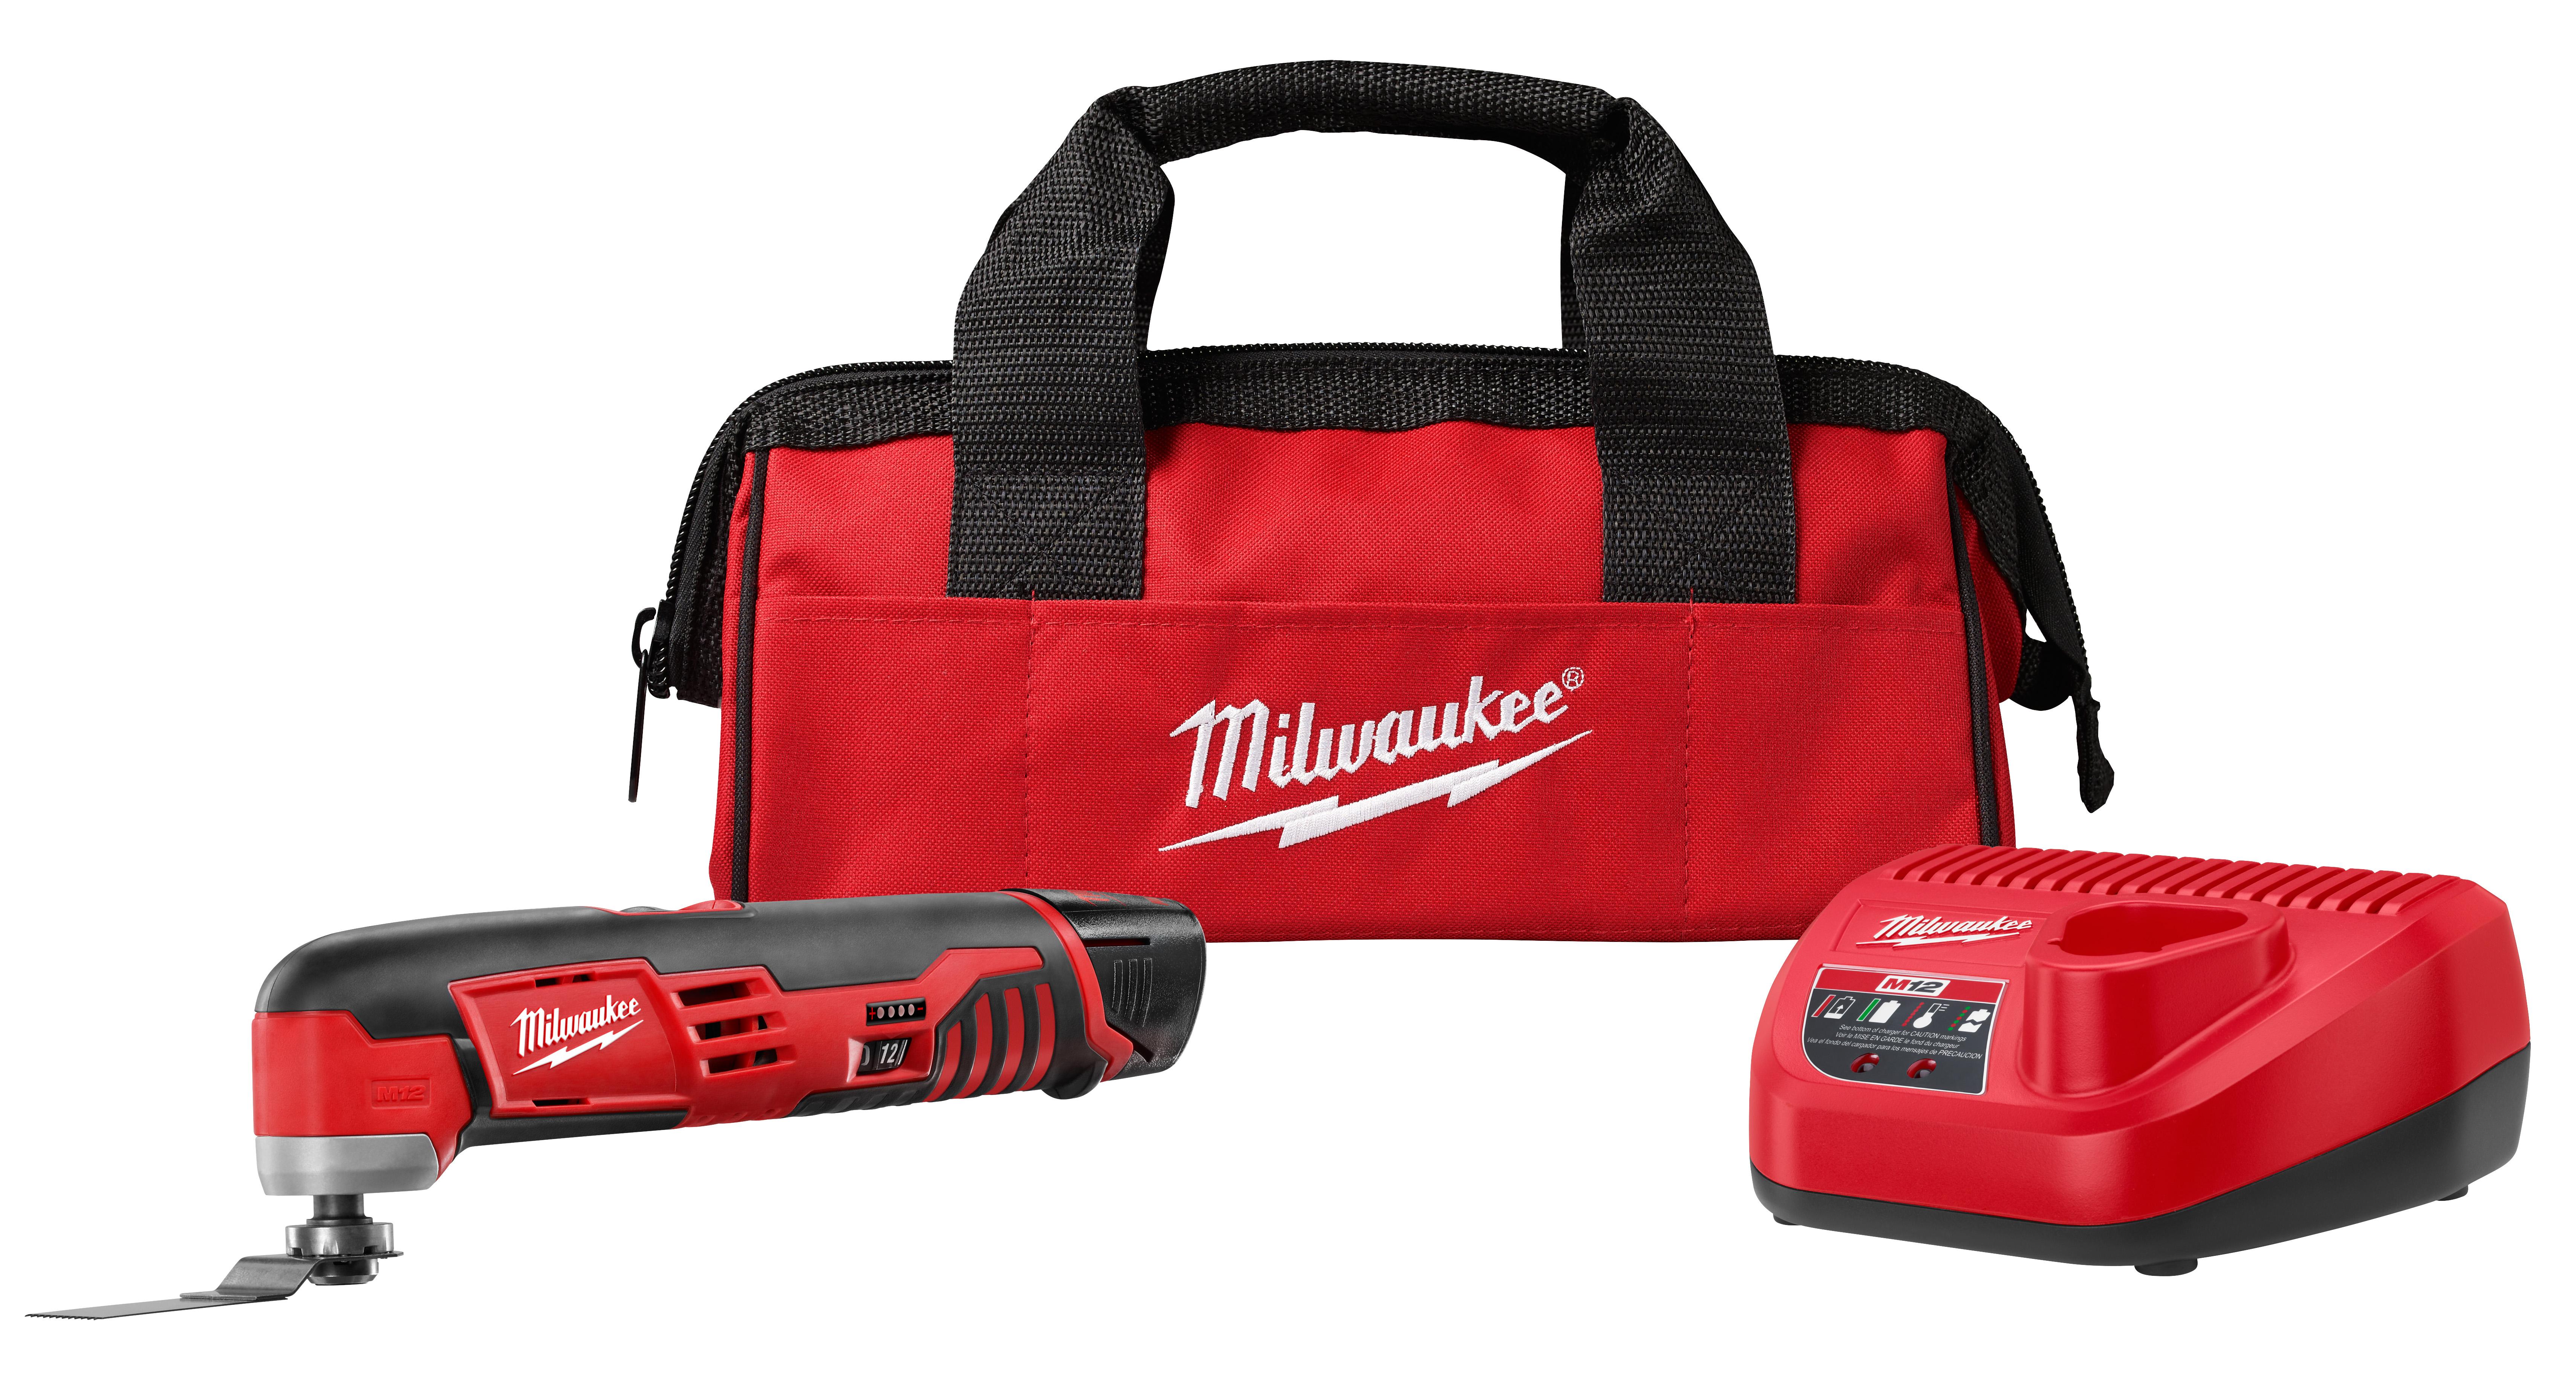 Milwaukee 2426-21 M12™ Cordless Lithium-Ion Multi-Tool One Battery Kit